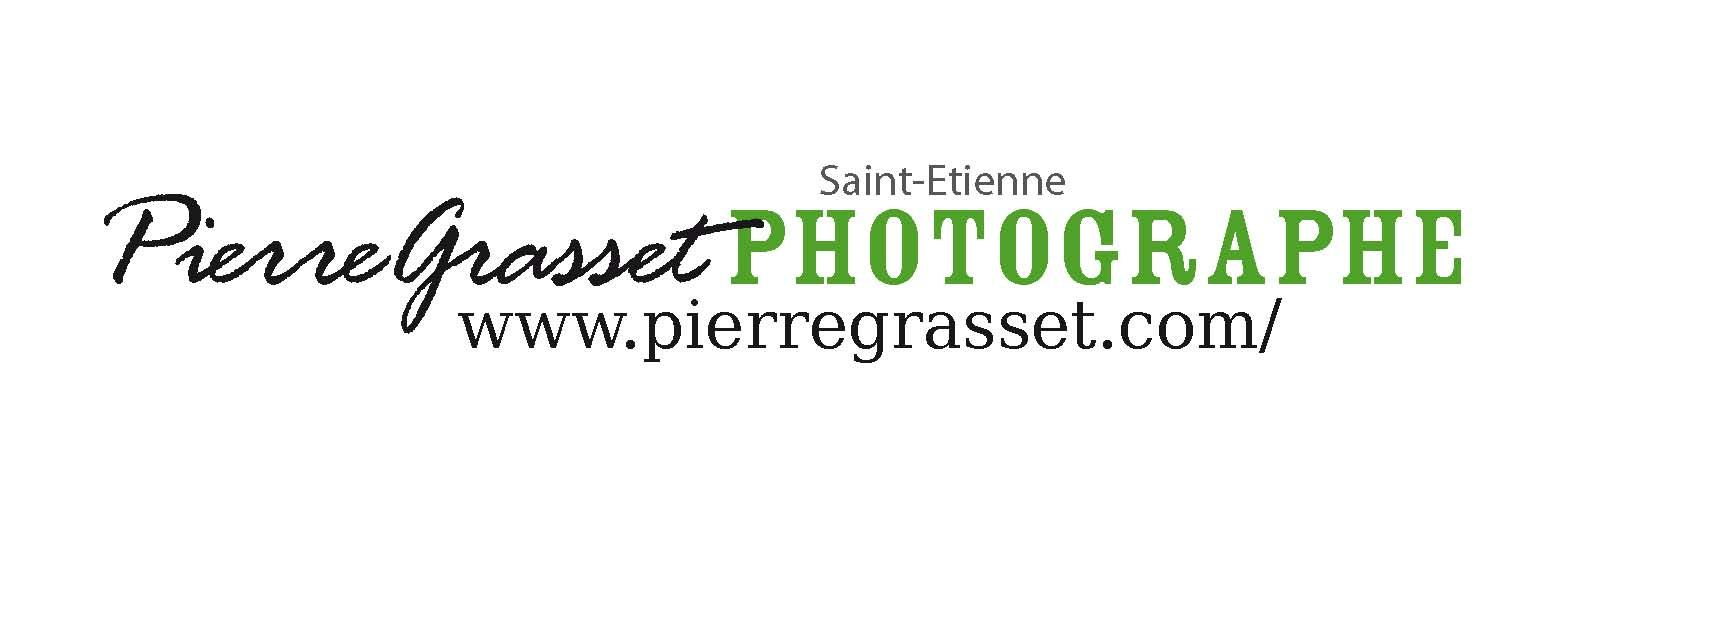 Pierre Grasset, photographe